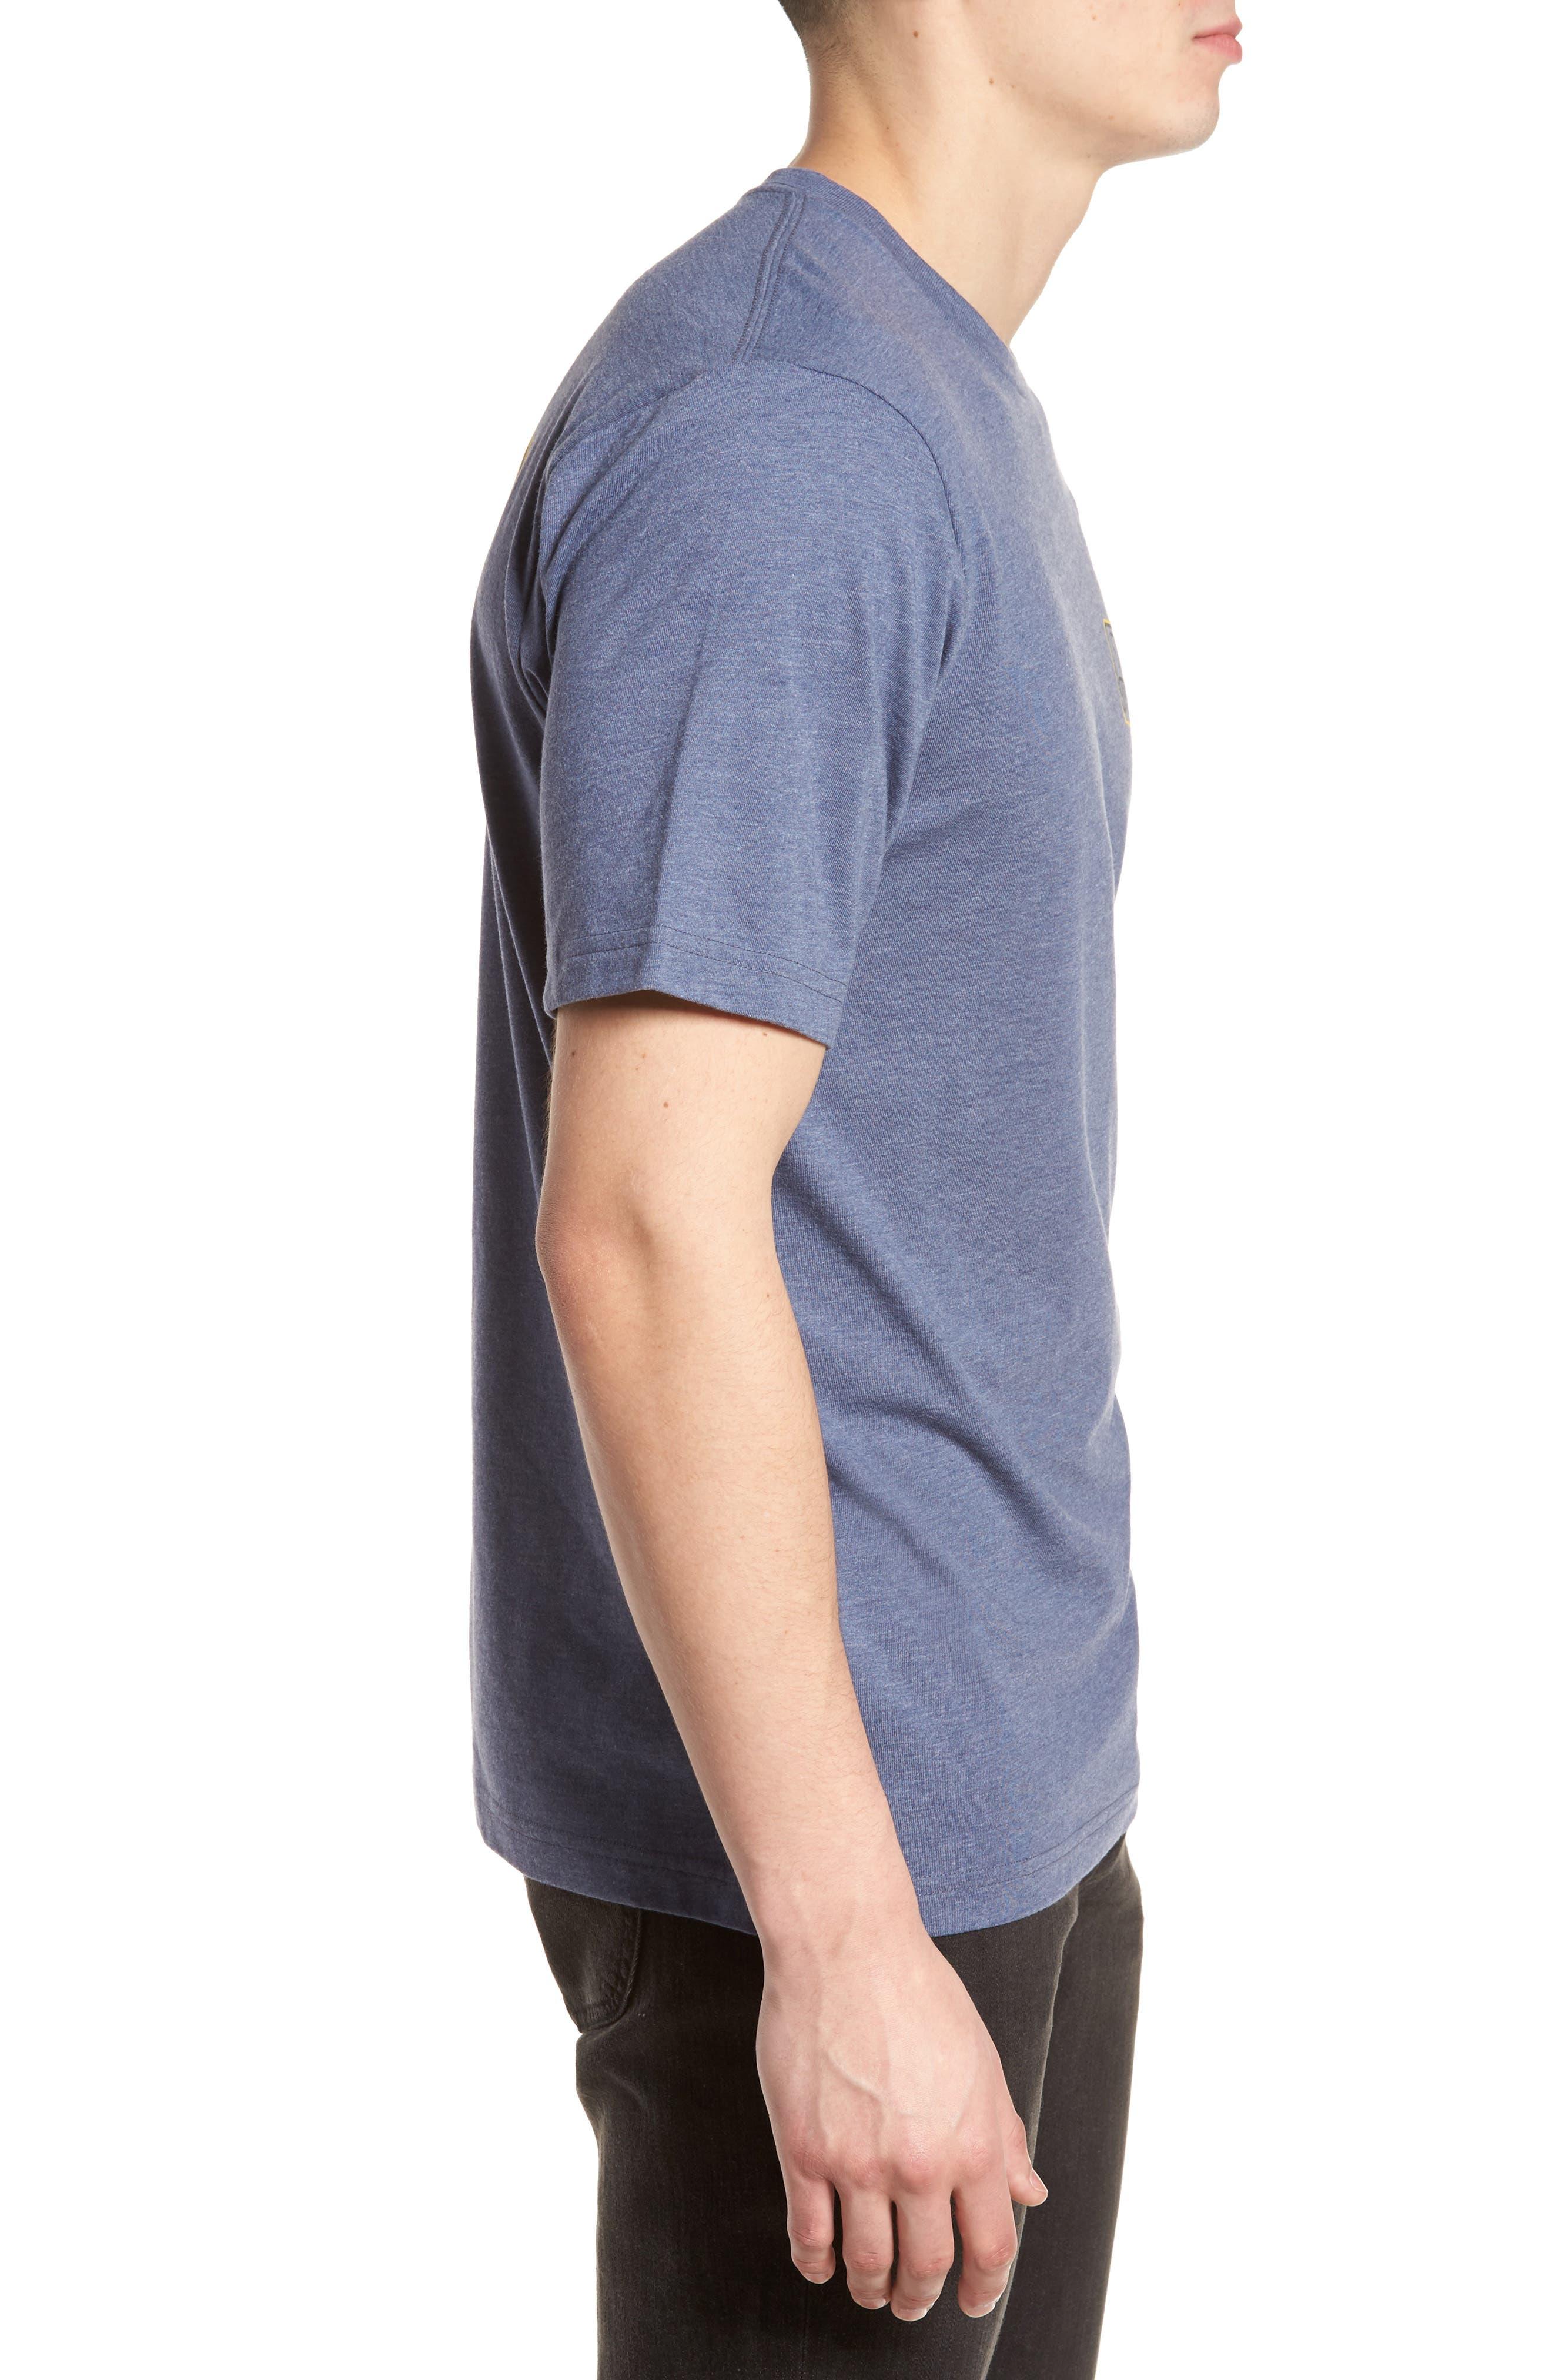 TRAVIS MATHEW,                             Truck Stop Graphic T-Shirt,                             Alternate thumbnail 3, color,                             400